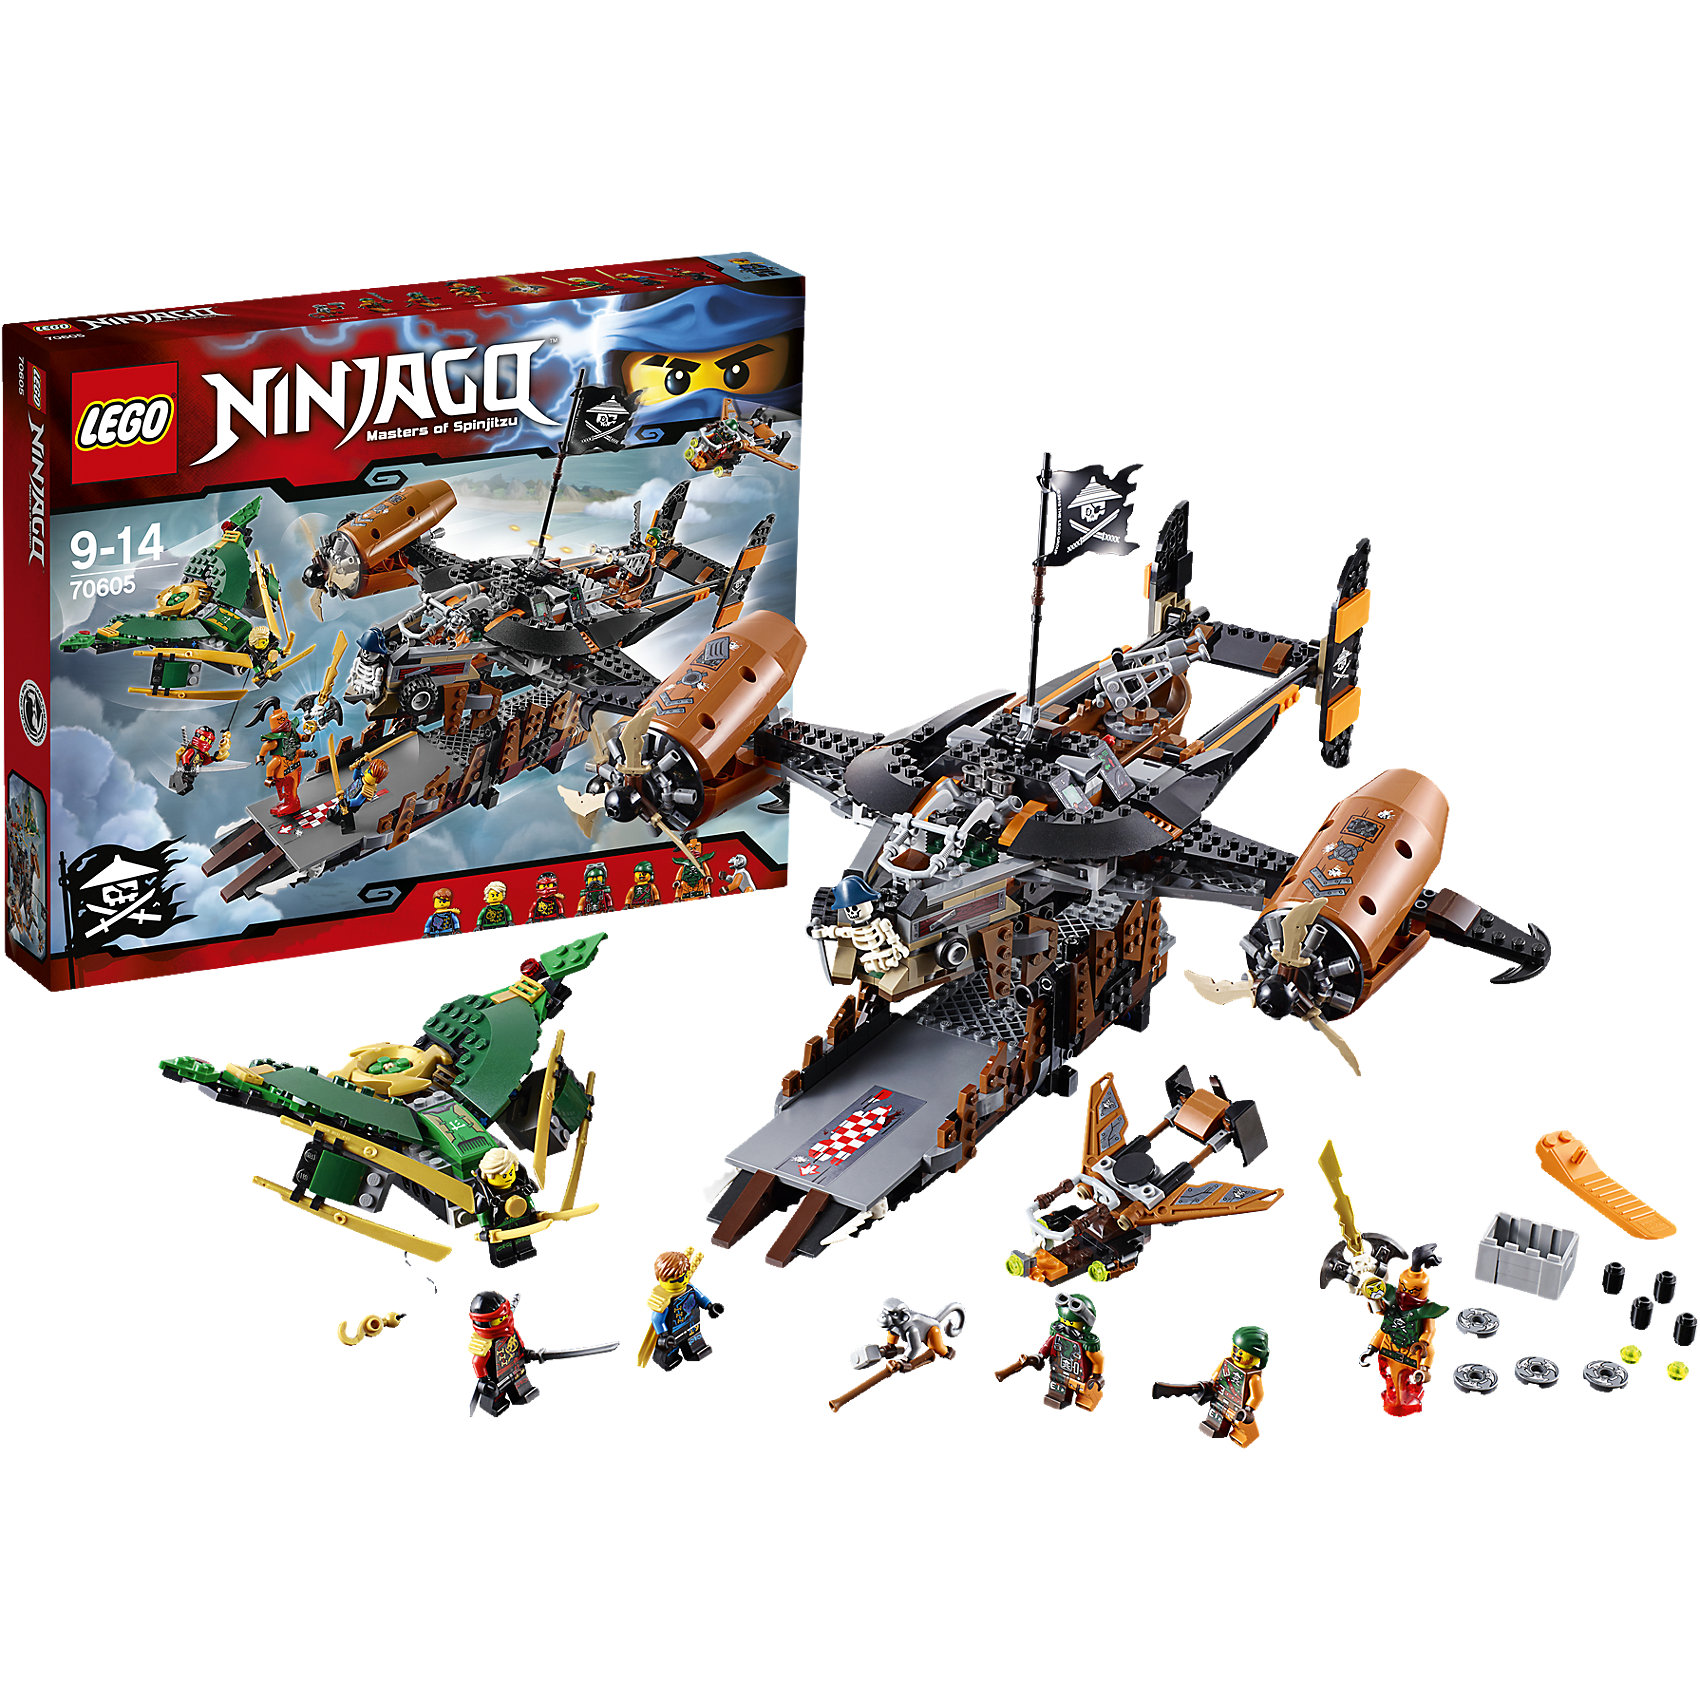 LEGO LEGO NINJAGO 70605: Цитадель несчастий